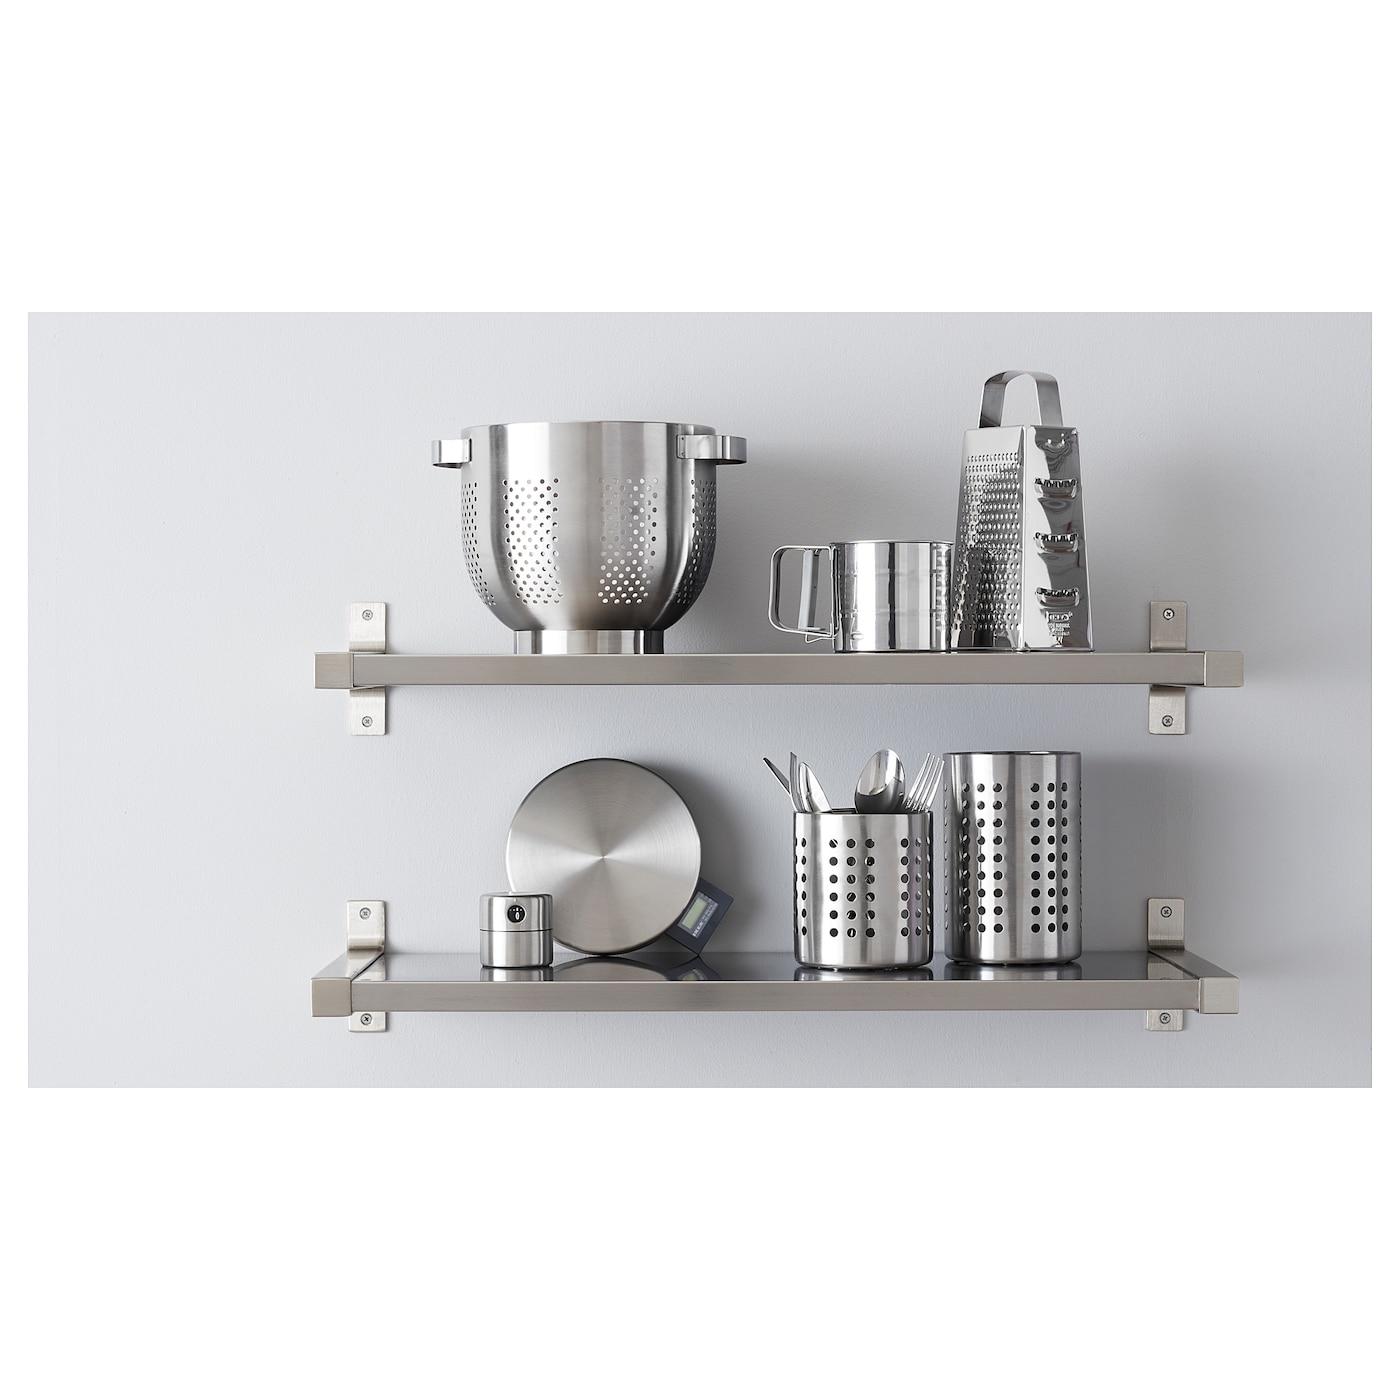 Ordning Pot à Ustensiles De Cuisine Acier Inoxydable 18 Cm Ikea